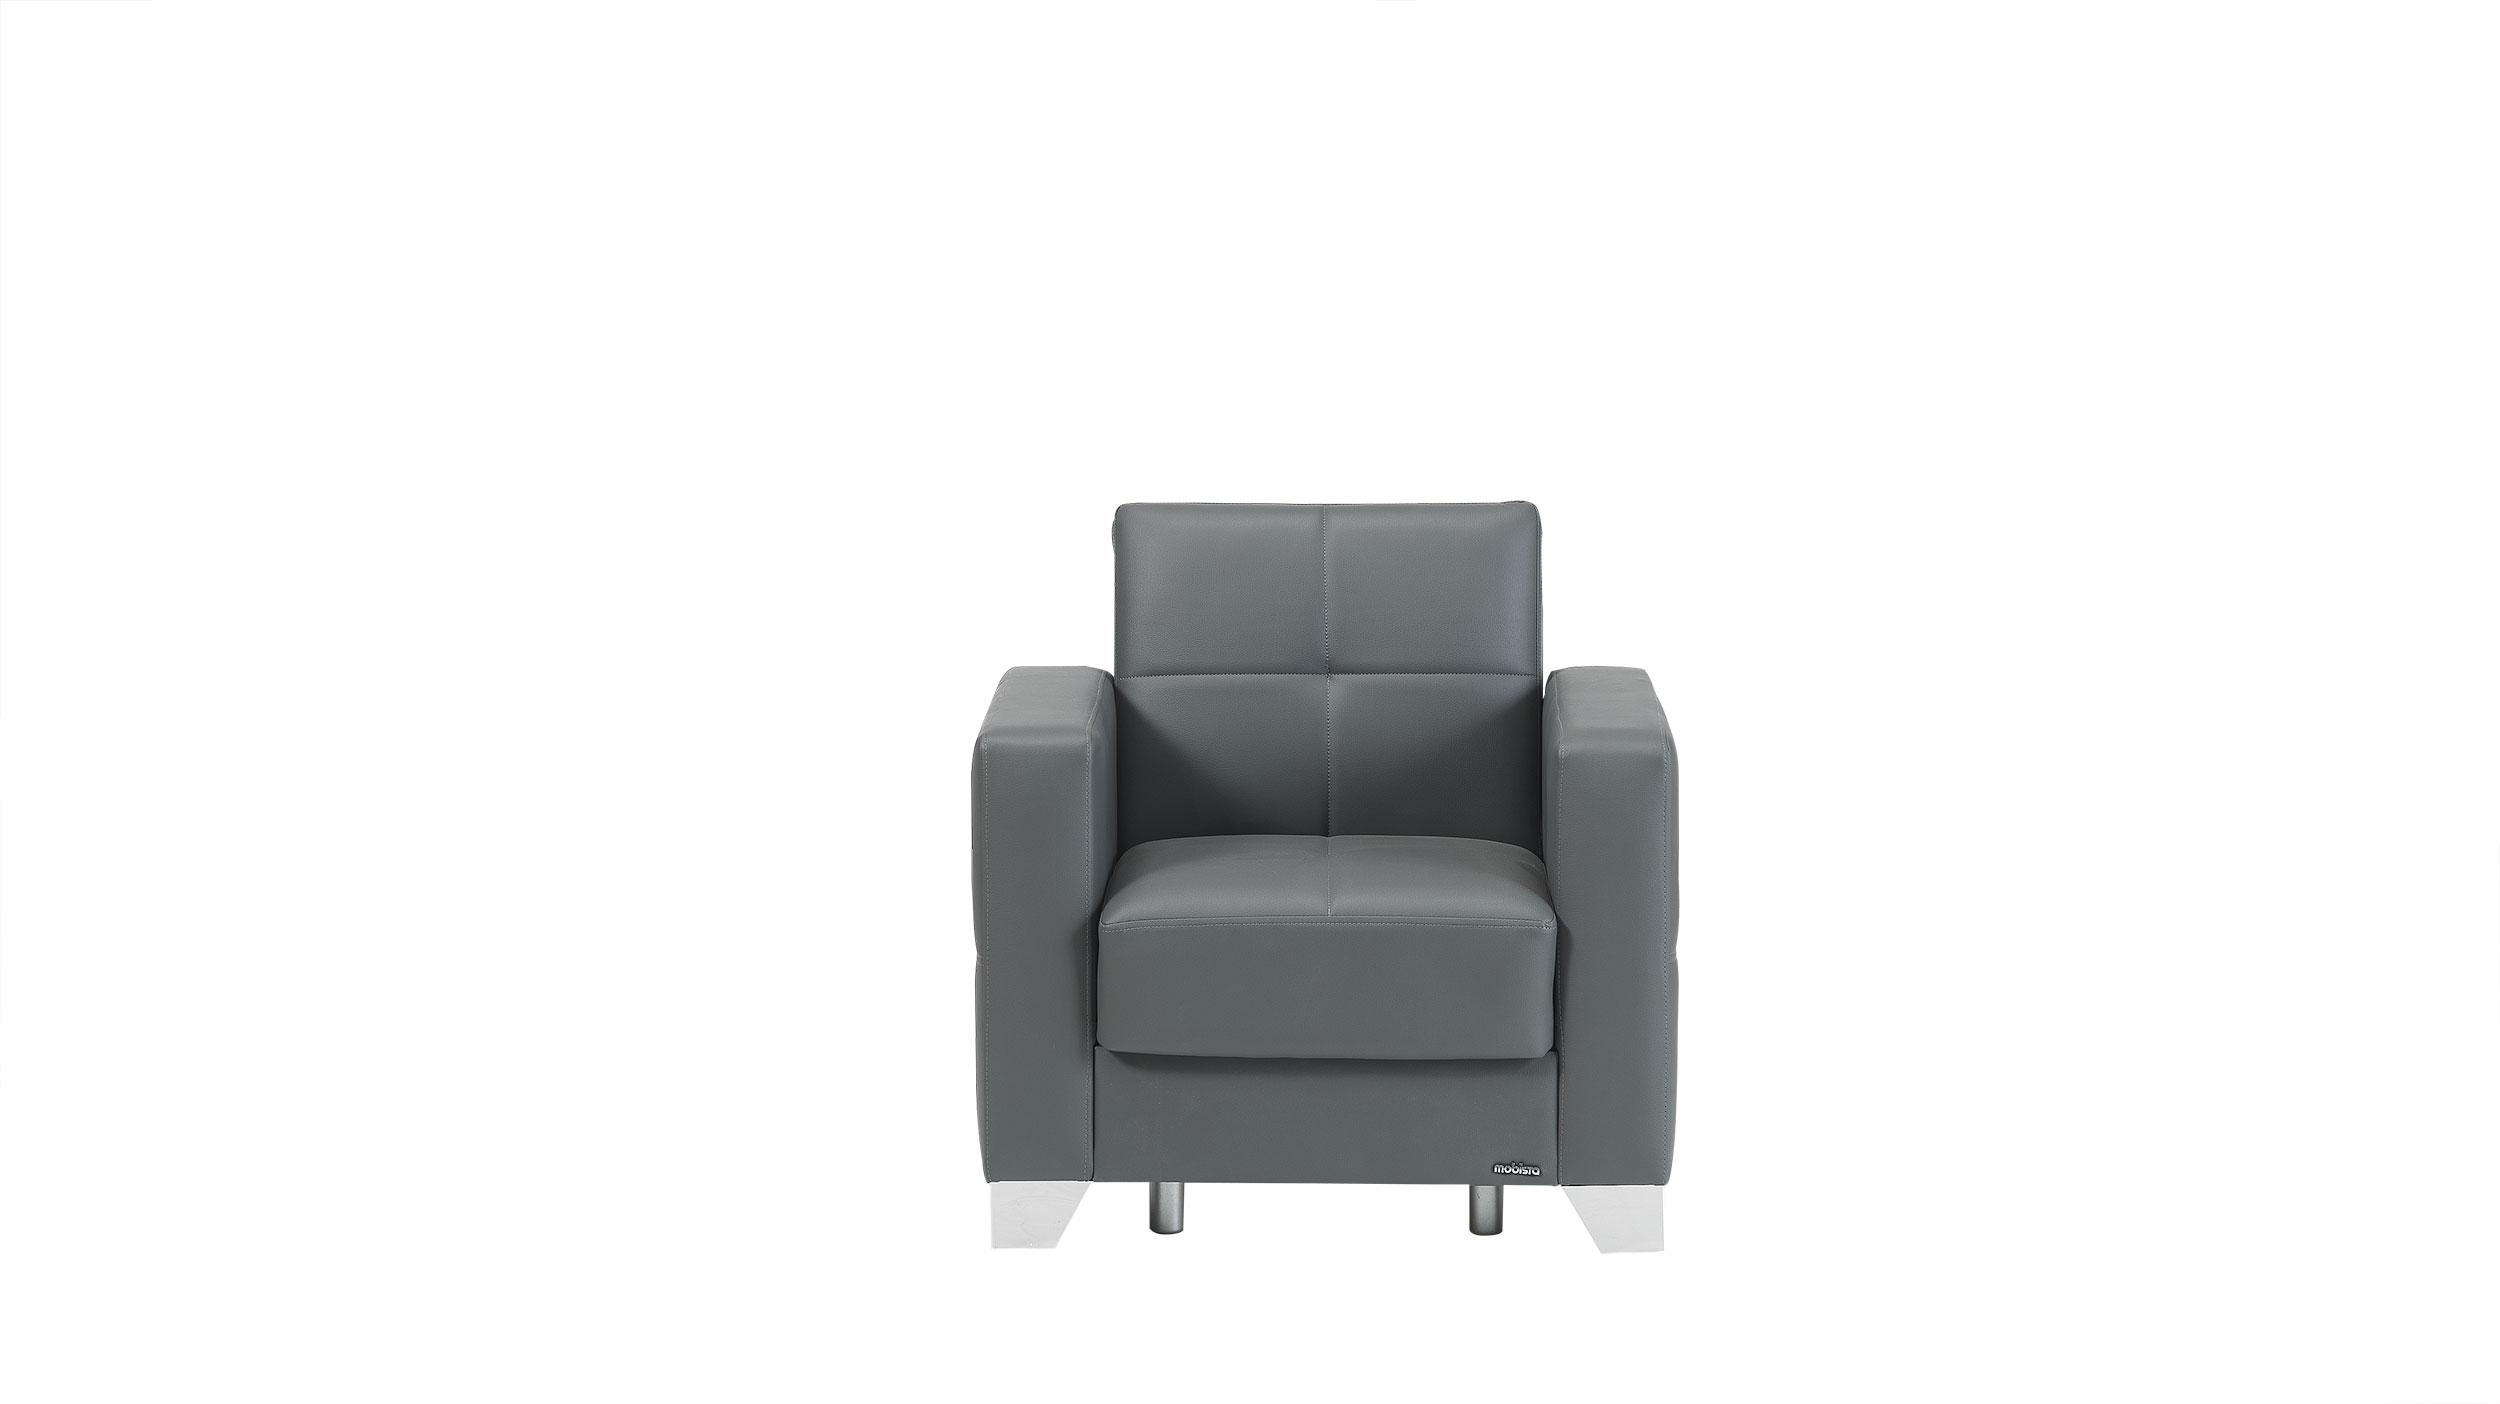 leatherette sofa durability mart cloud reviews viva italia prestige dark gray armchair by mobista